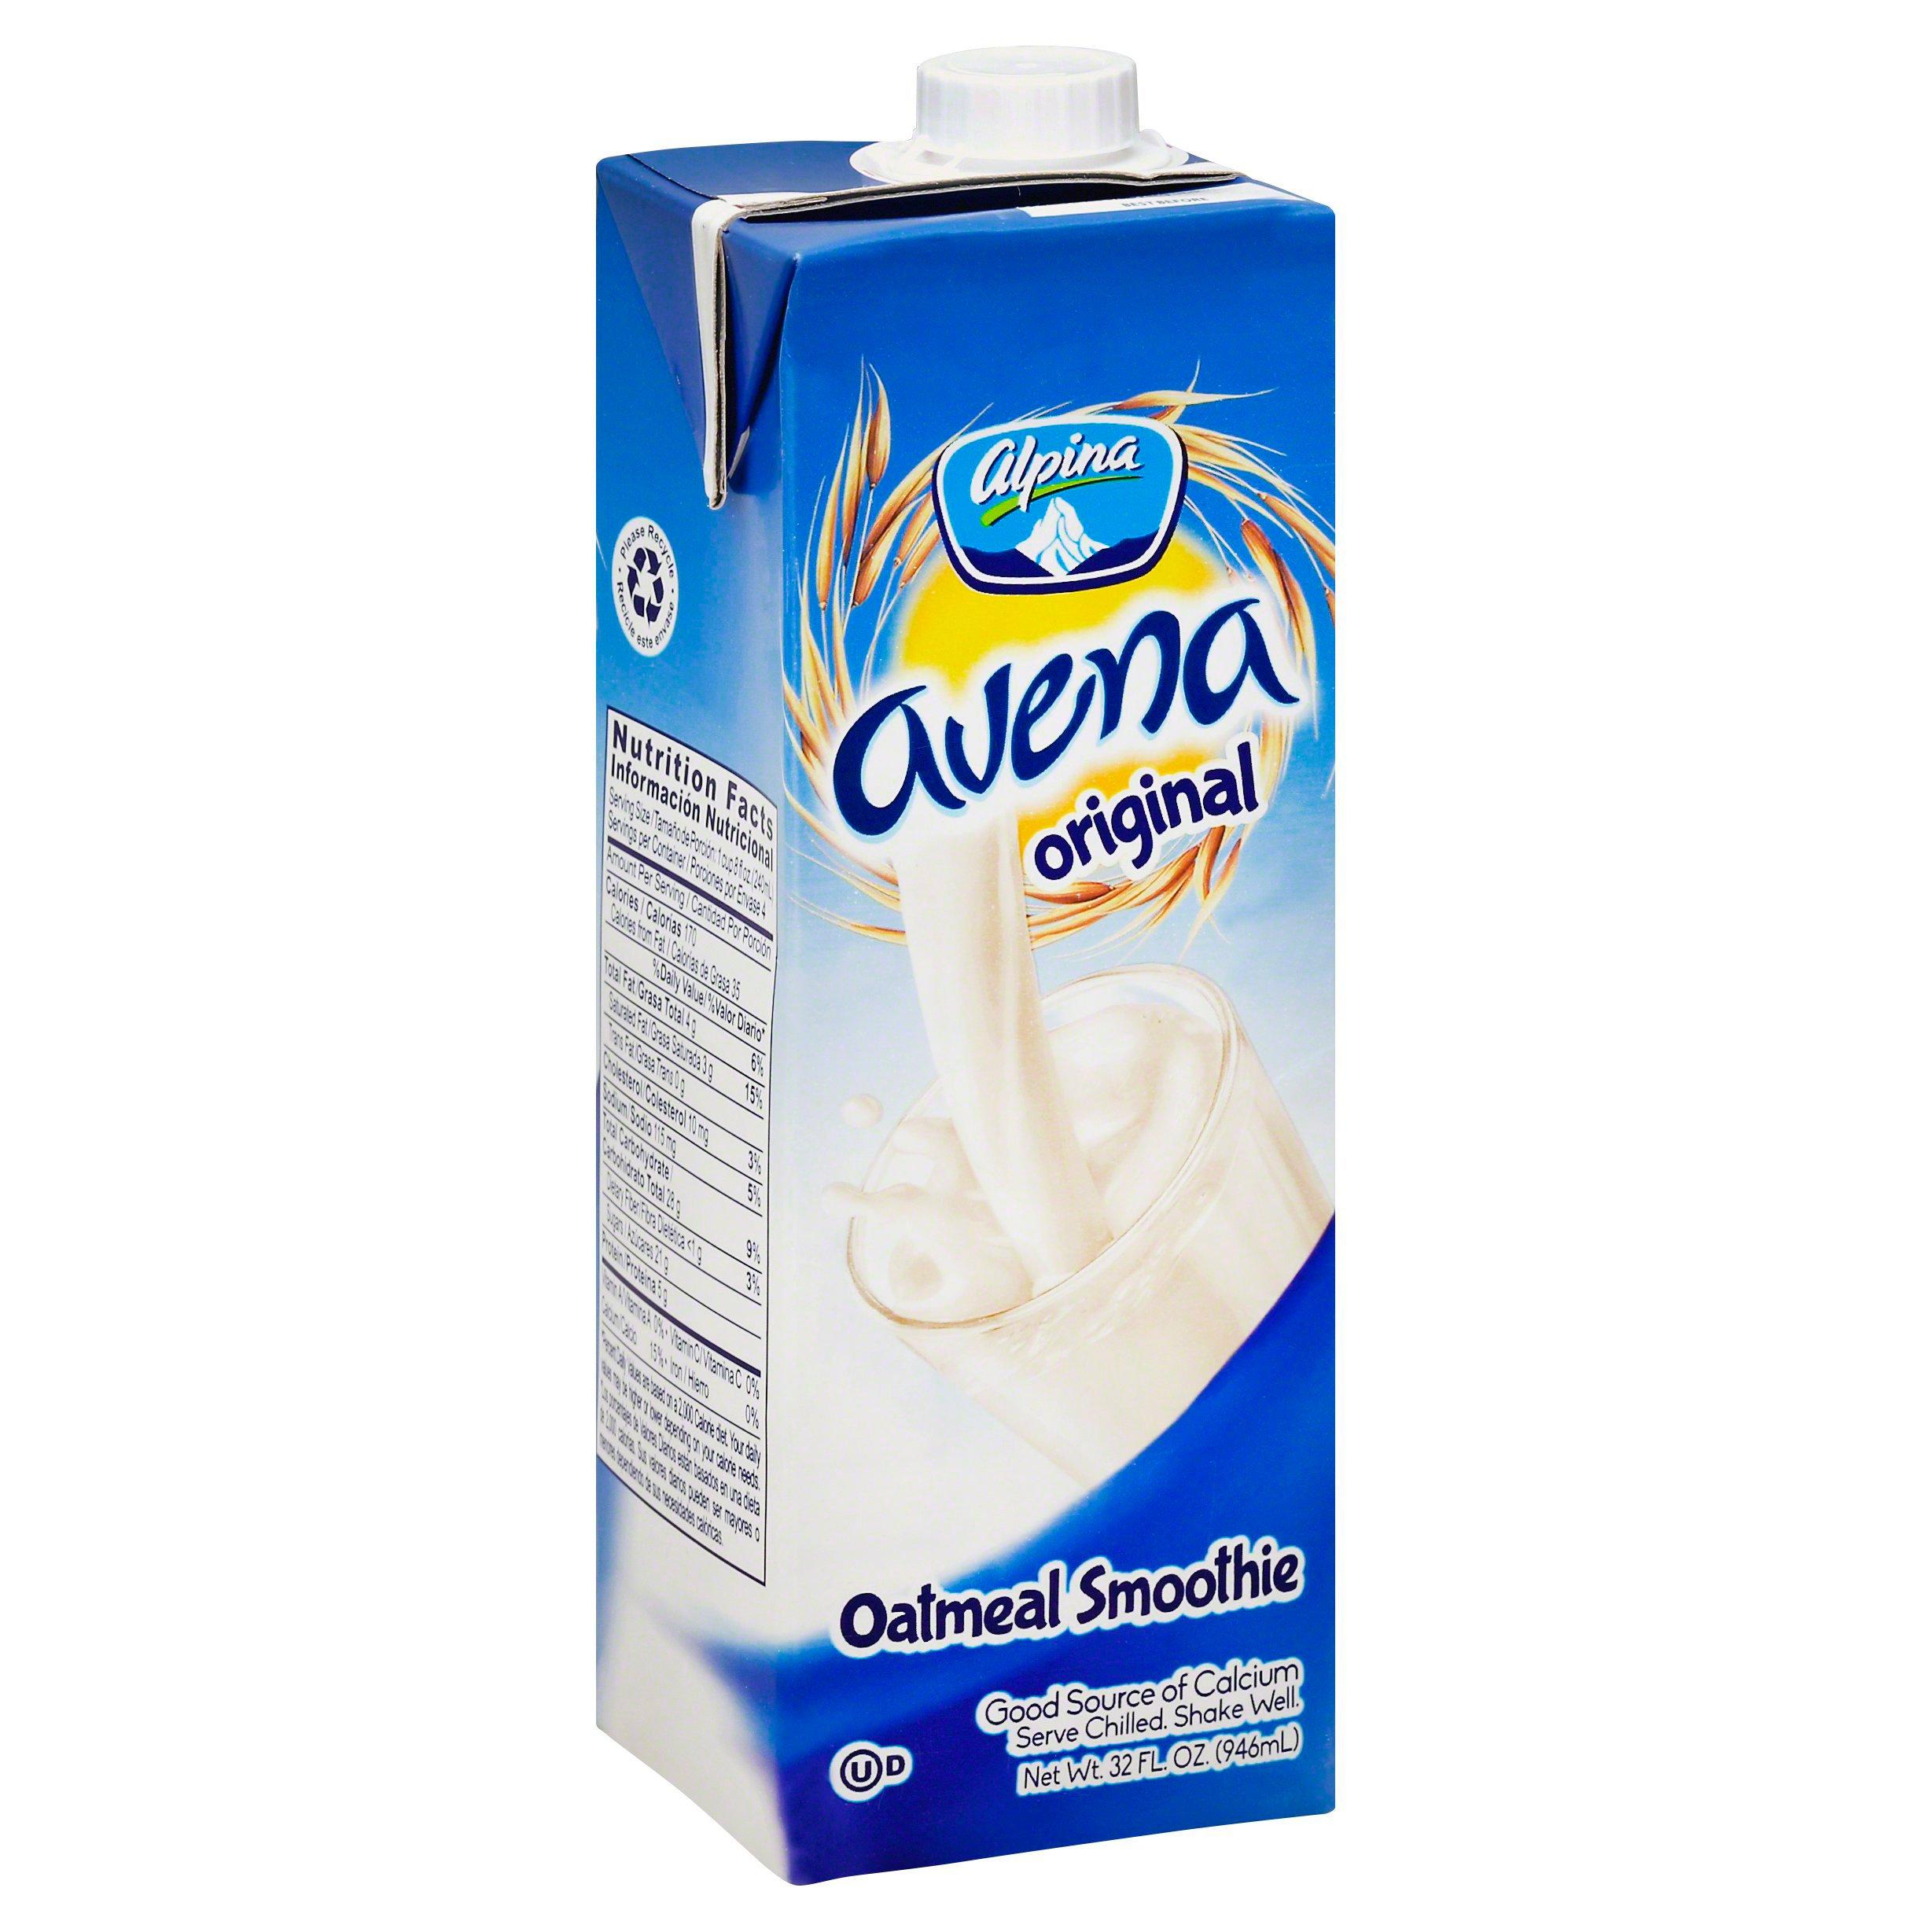 Alpina Avena Original Oat Based Smoothie - Shop Latin American at HEB